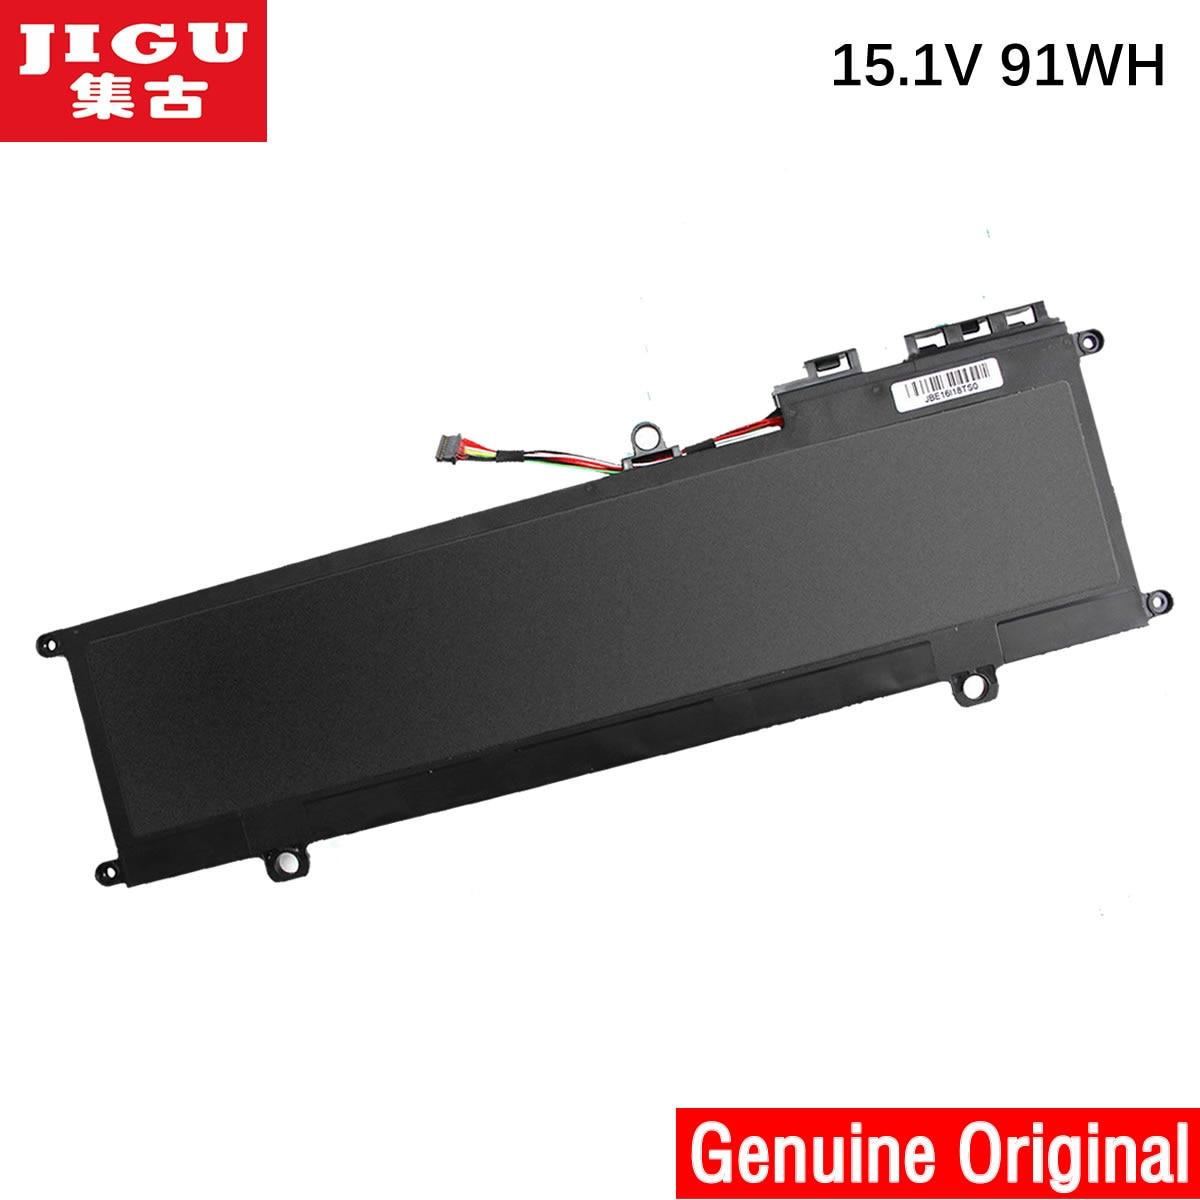 все цены на JIGU 15.1V 91Wh New Original Laptop Battery for Samsung AA-PLVN8NP ATIV Book 8 880Z5E NP880Z5E NP880Z5E-X01UB онлайн